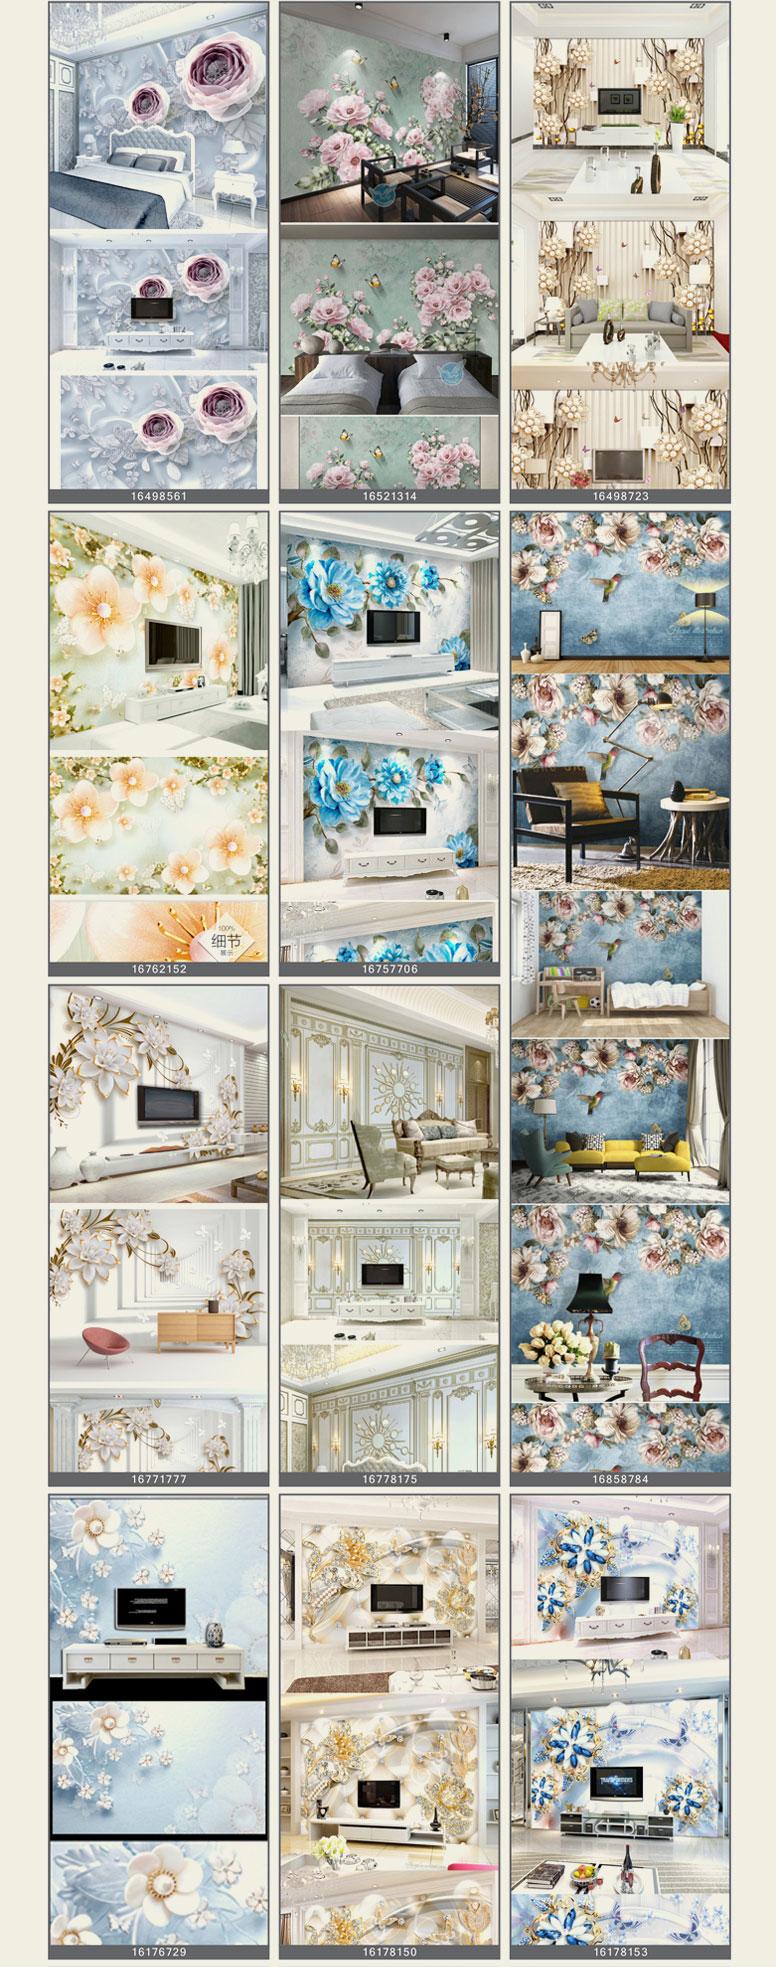 کاغذ دیواری سه بعدی پوستر دیواری پوستر سه بعدی تصاویر هنری تصاویر لایه باز گل هلندی وال تصاویر لوکس تصاویر سقف